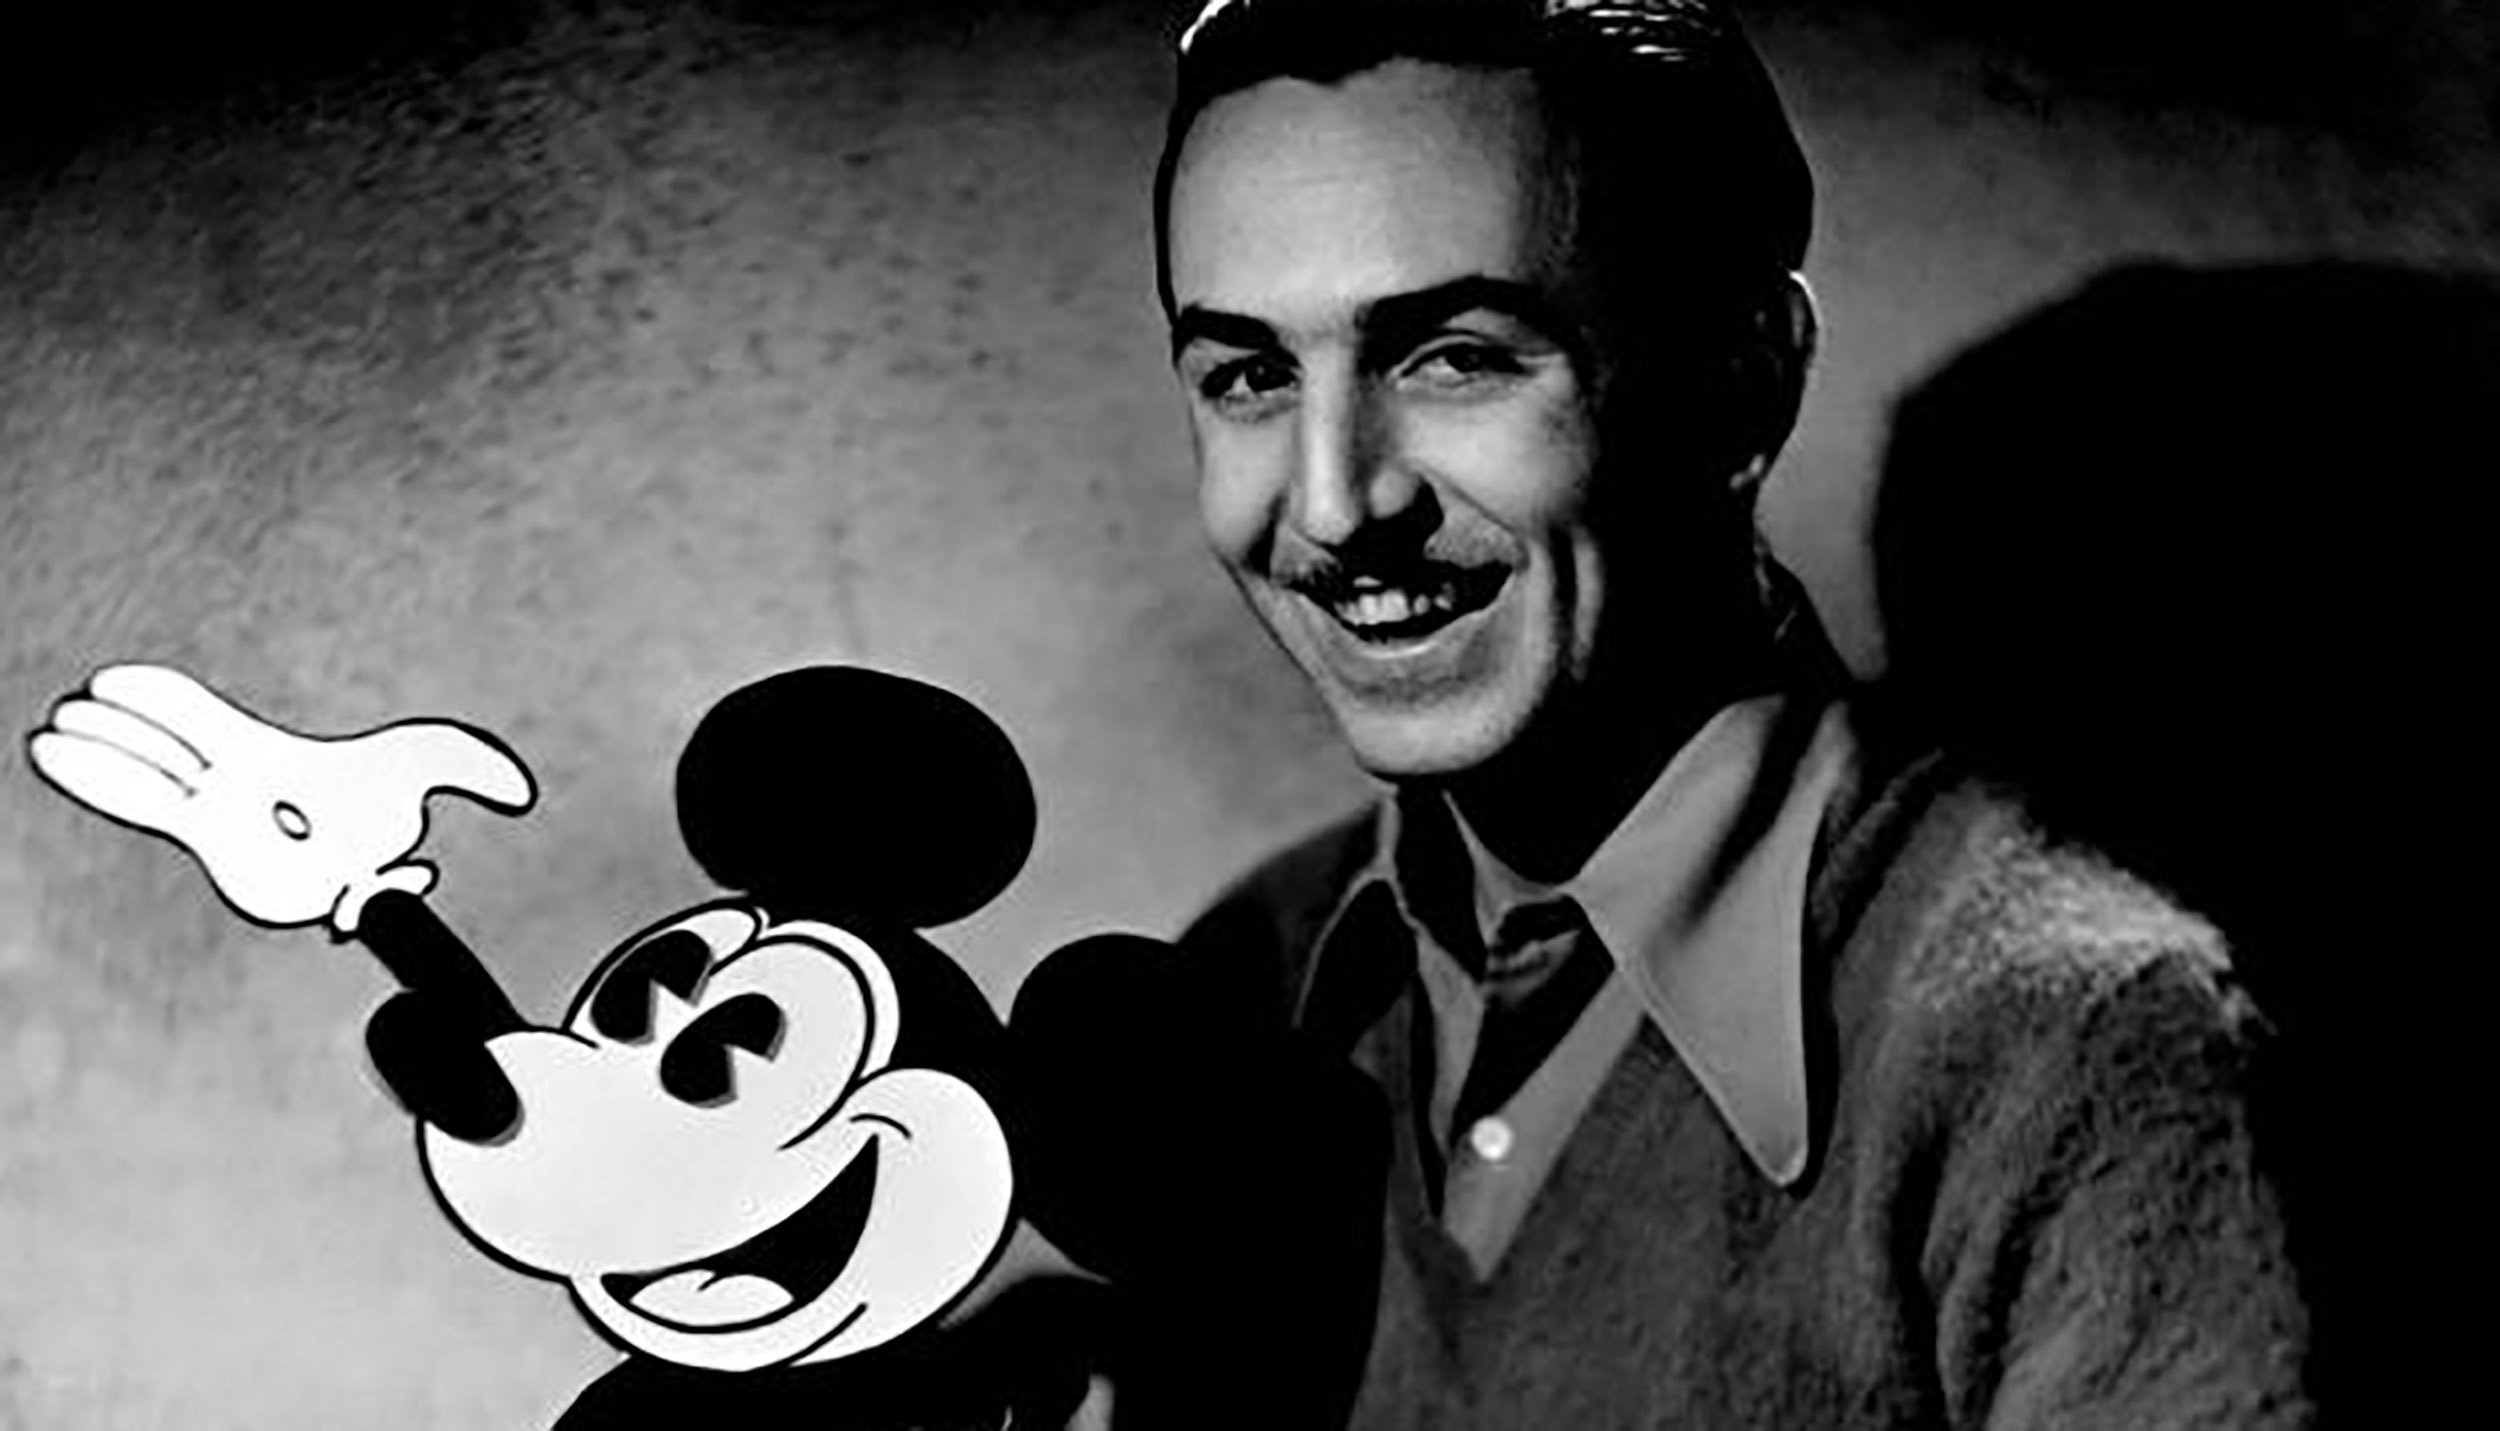 The Godless Side of Walt Disney